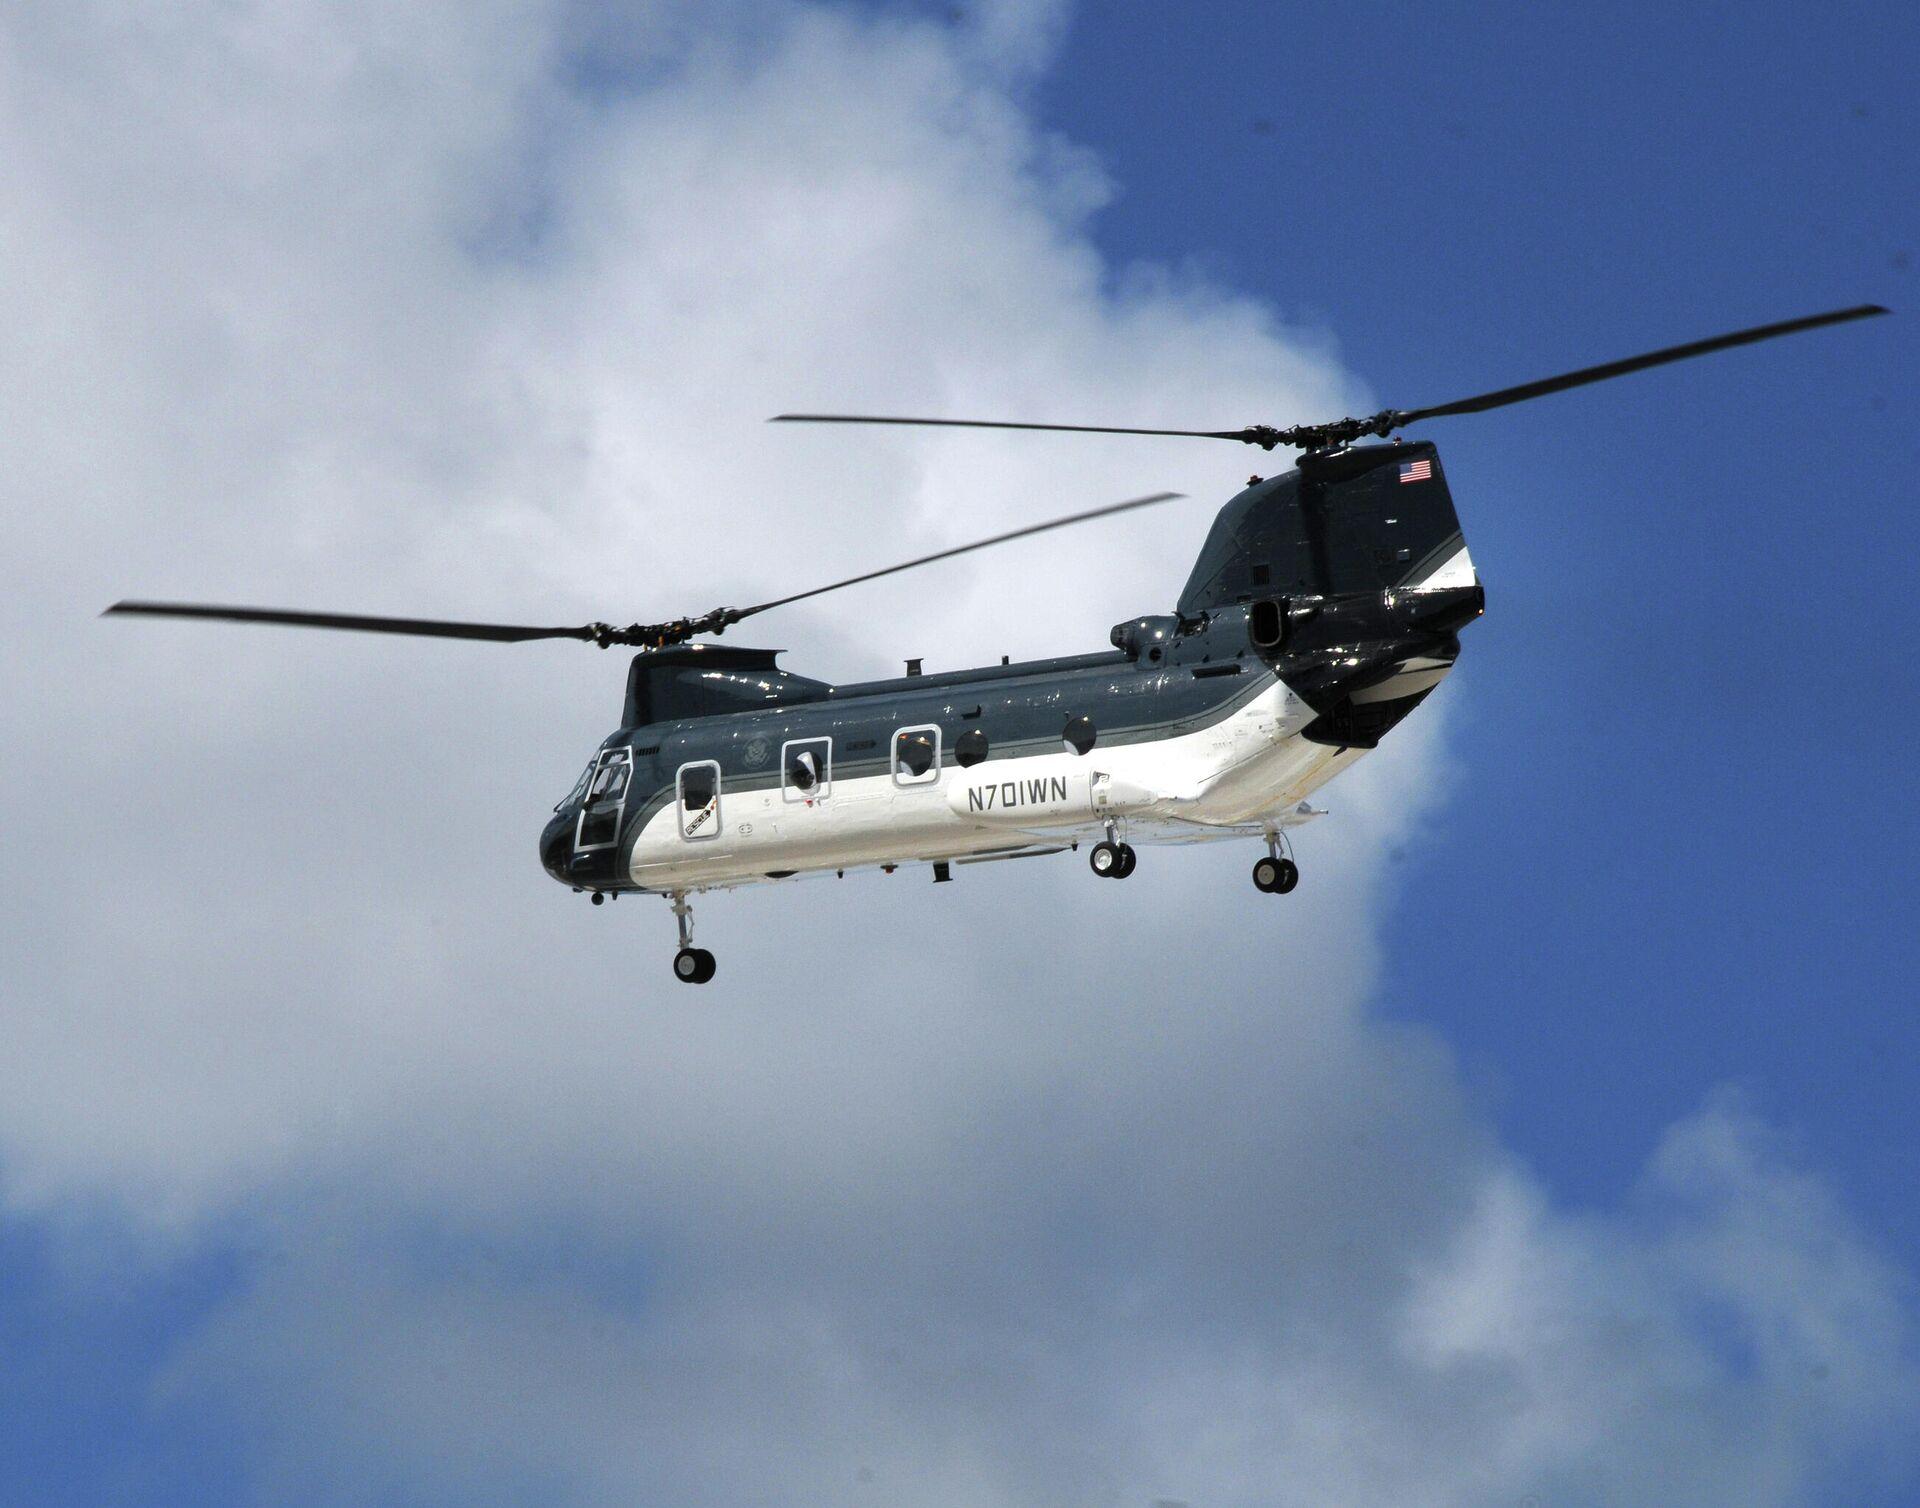 Un CH-46E del Departamento de Estado - Sputnik Mundo, 1920, 20.08.2021